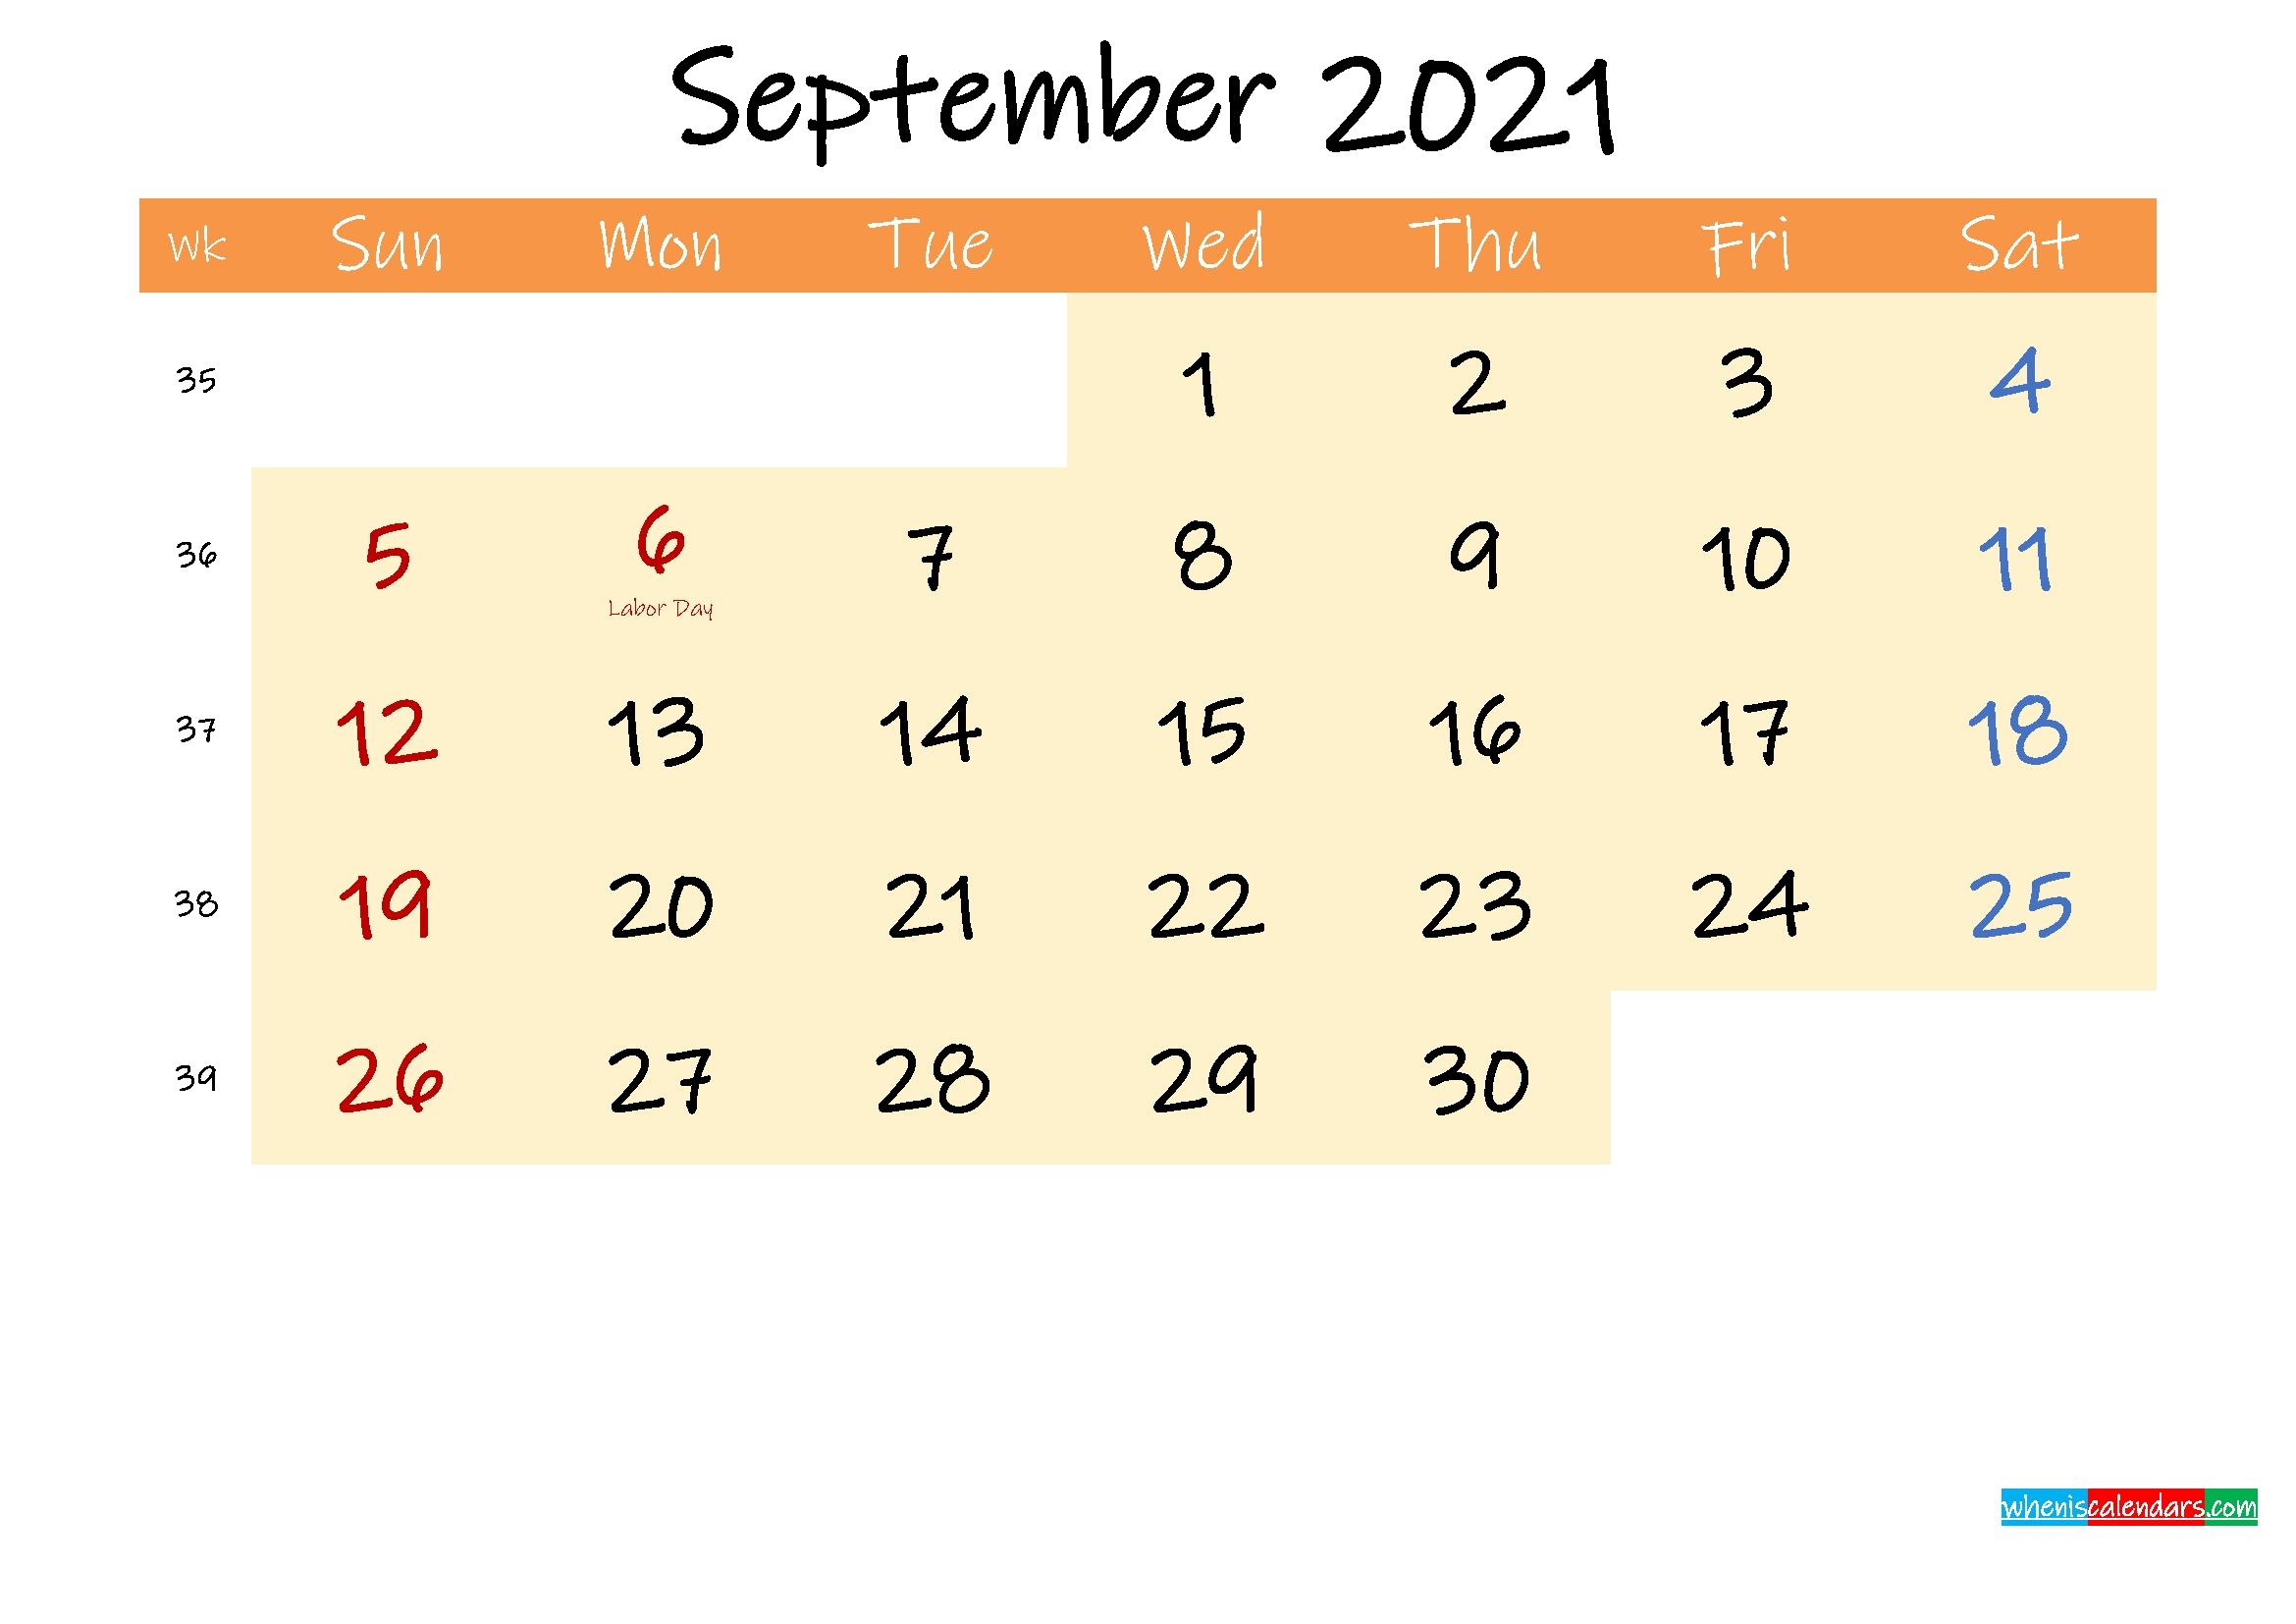 September 2021 Calendar Printable Template | Calendar Printables Free Blank September 2021 Calendar Template